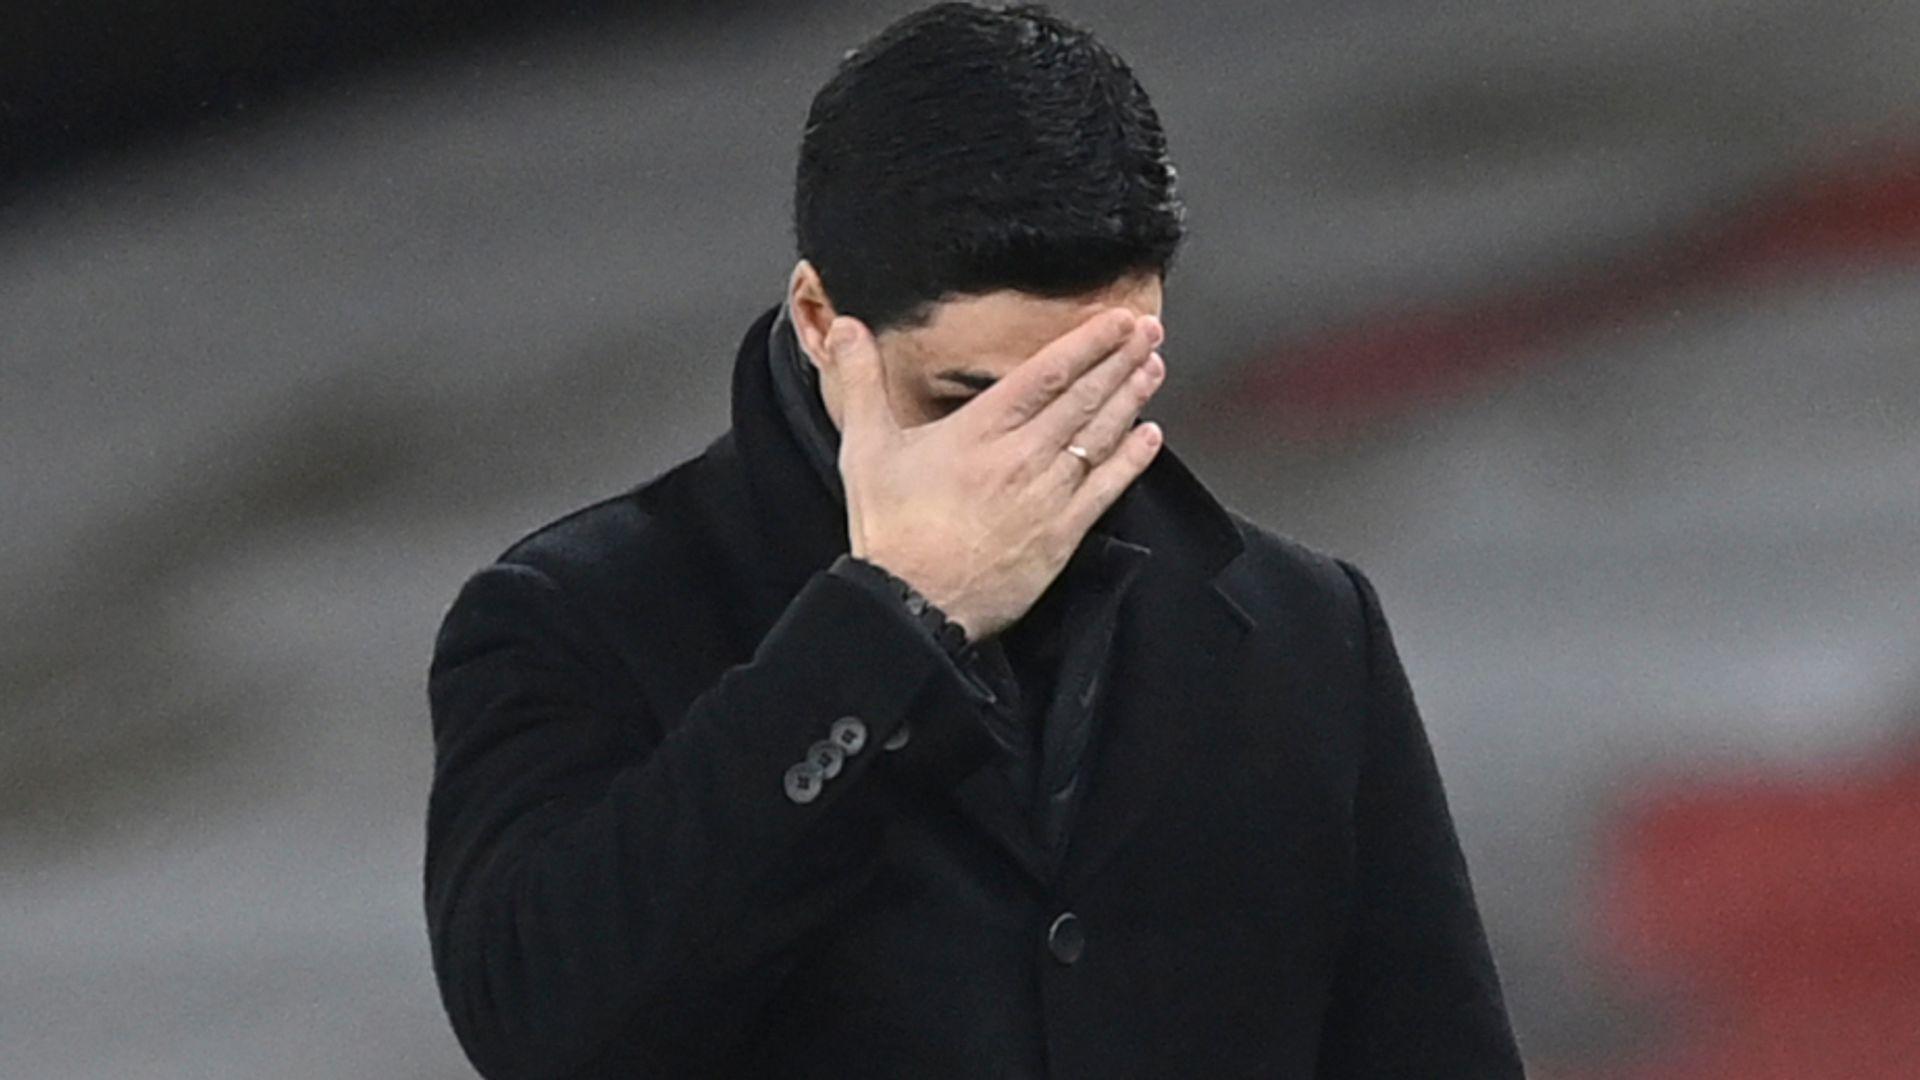 Hits & misses: Jury still out on Arteta's Arsenal